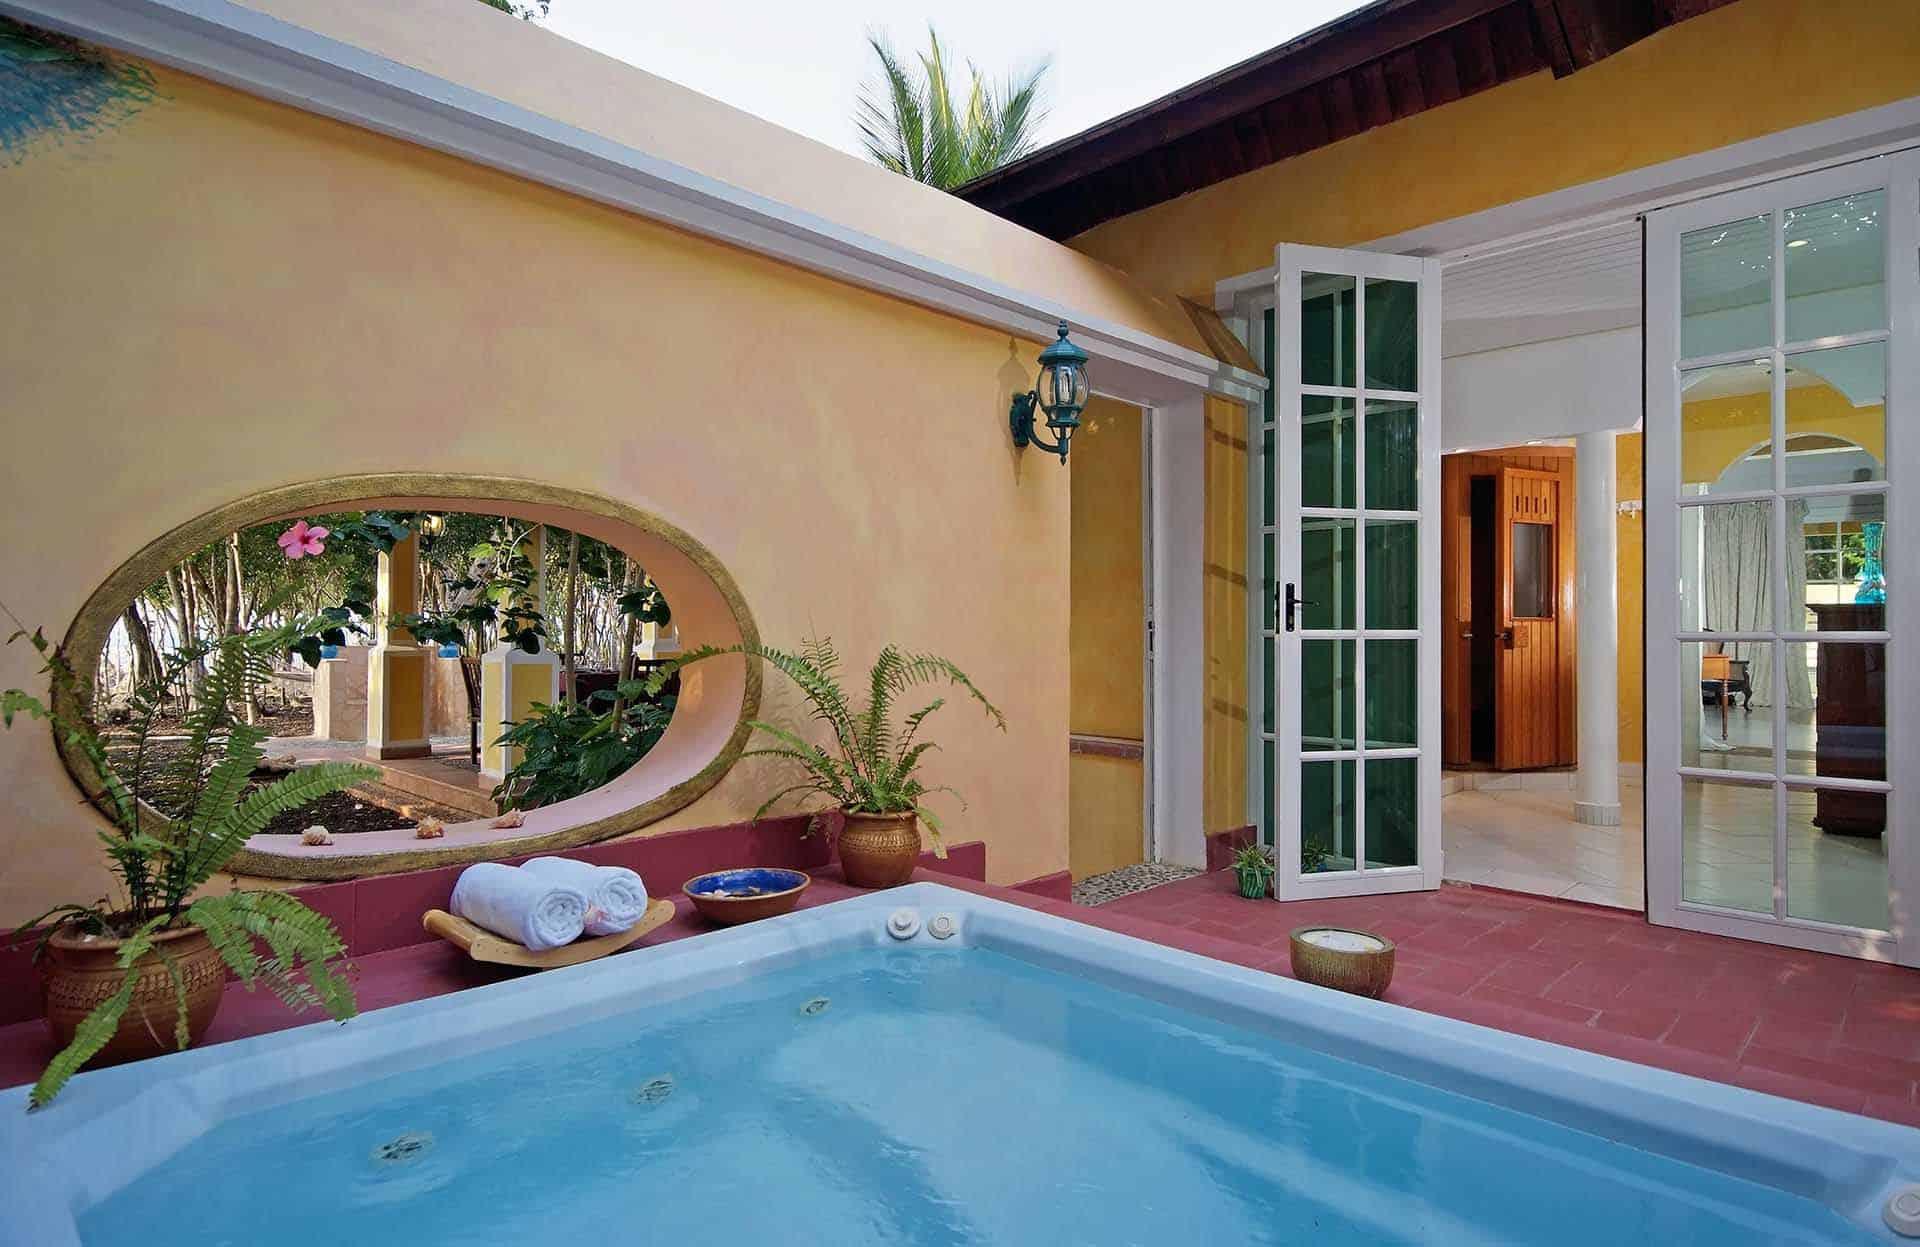 H2068 Villa Rio de oro 01 cuba autrement